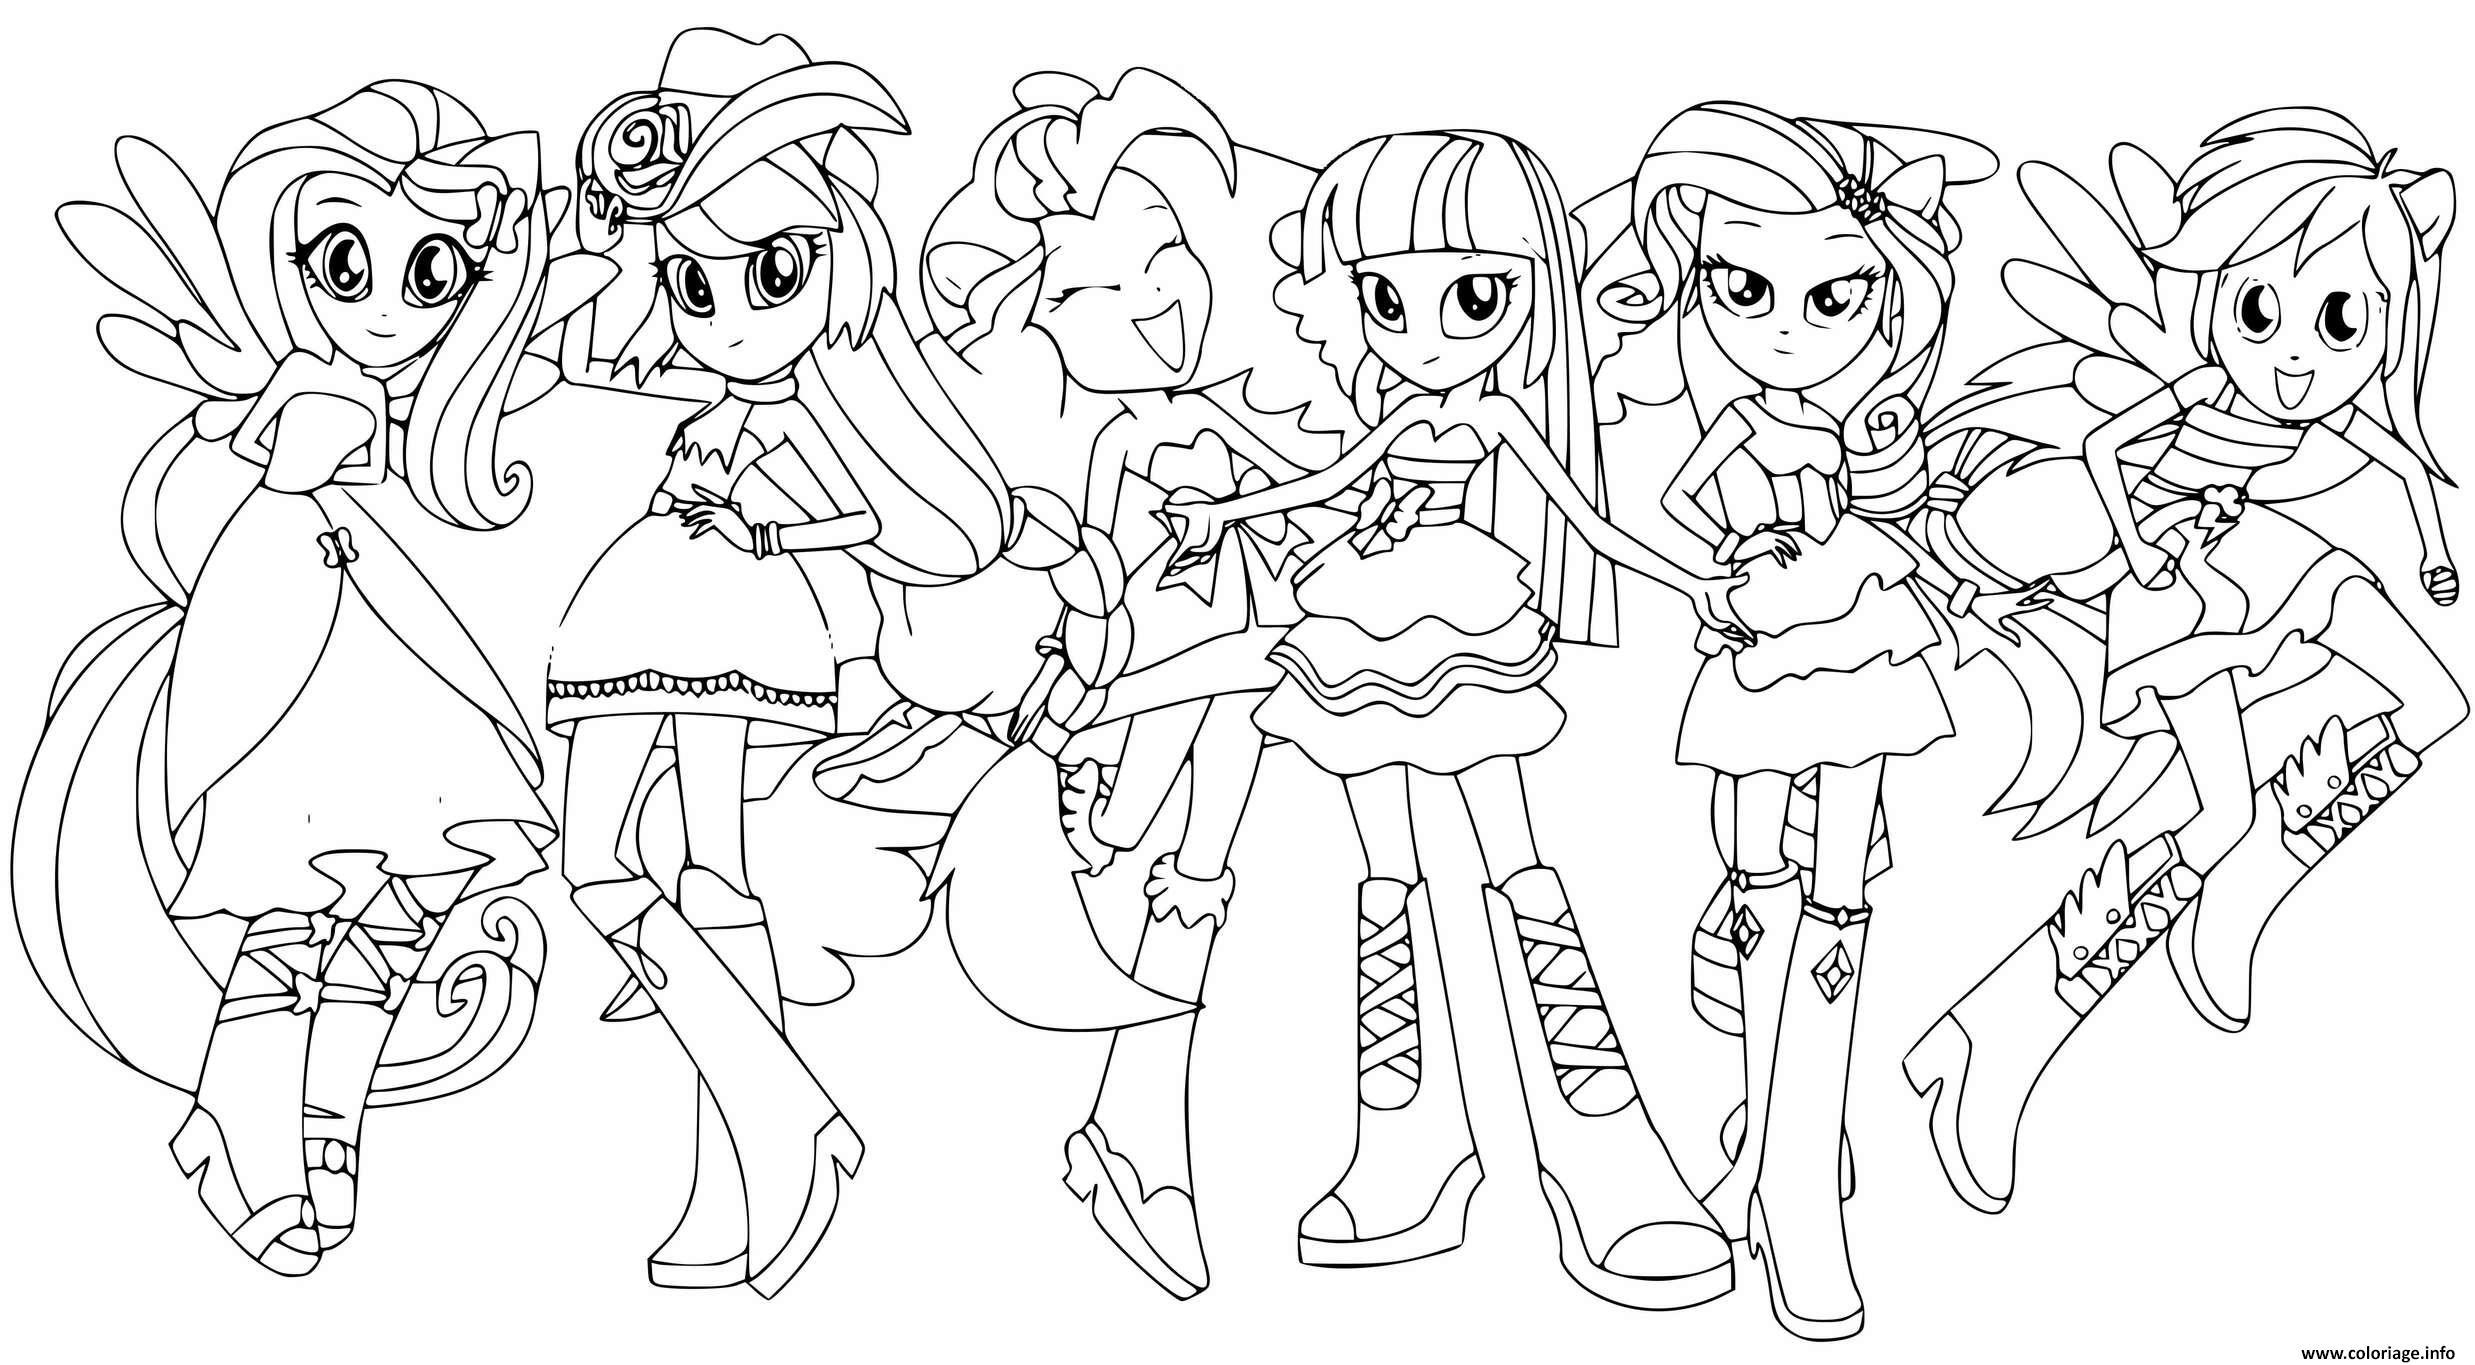 Dessin Equestria Girls fashion dolls Coloriage Gratuit à Imprimer